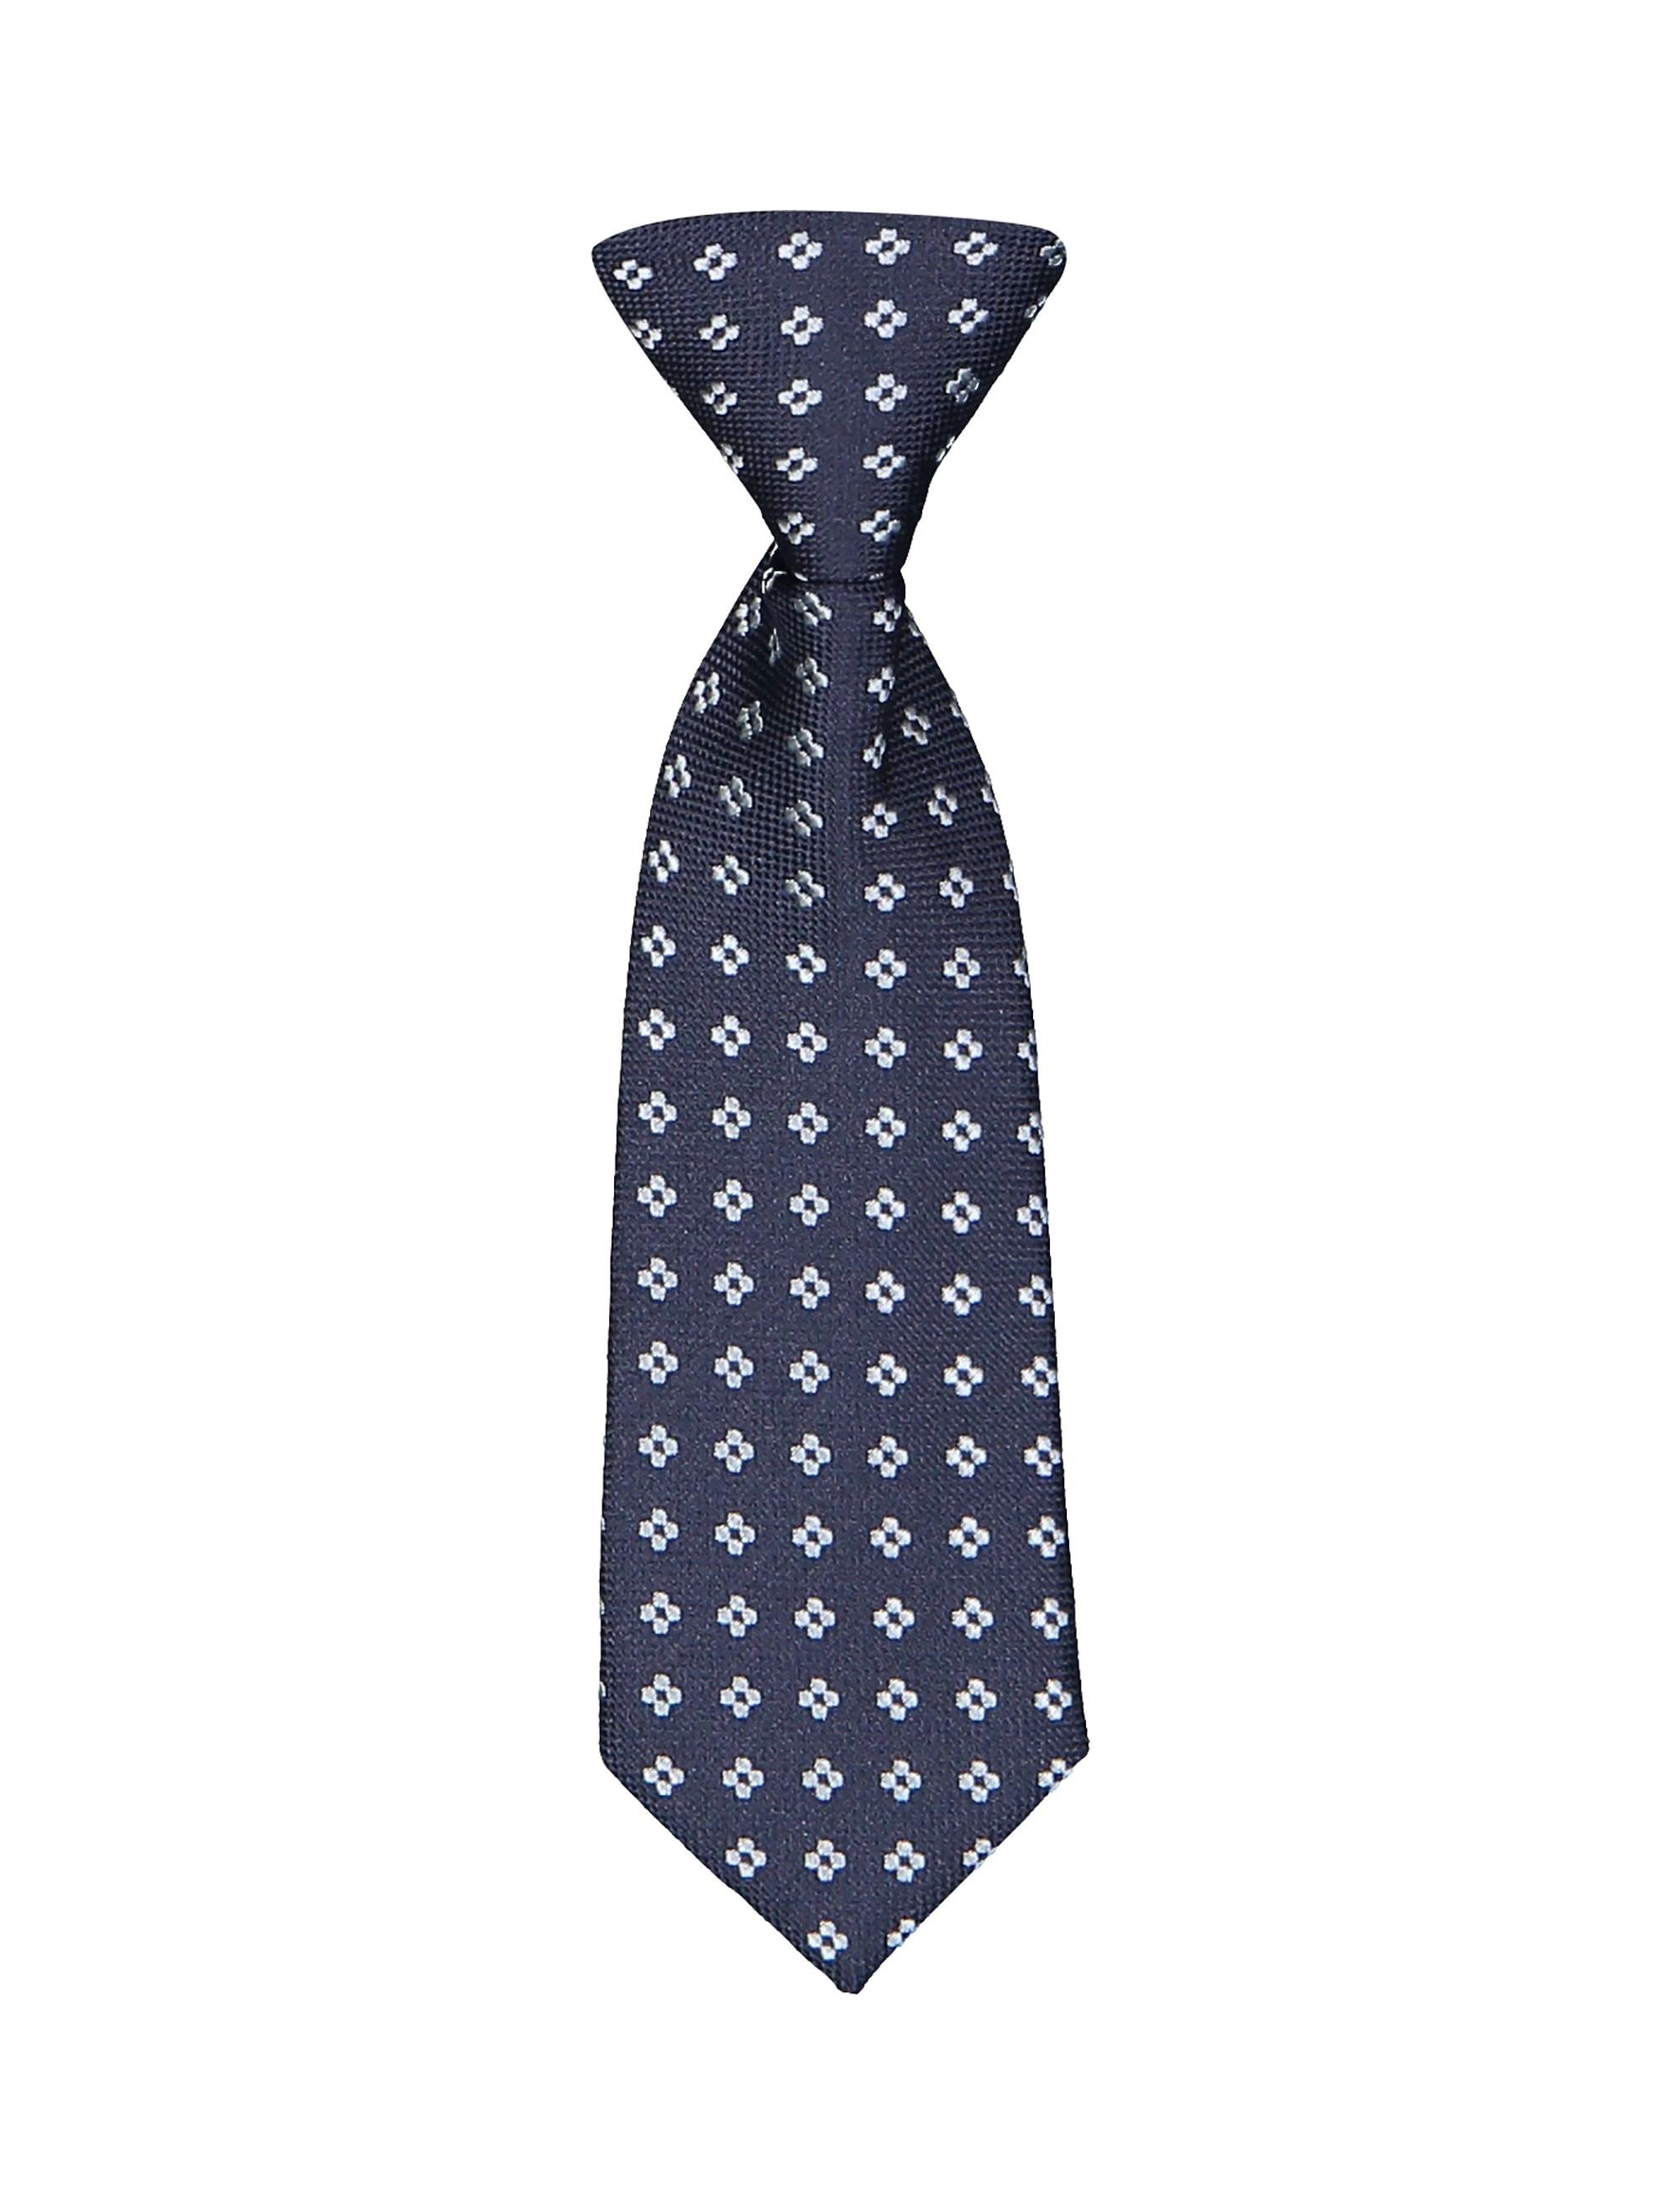 کراوات طرح دار پسرانه - ایدکس